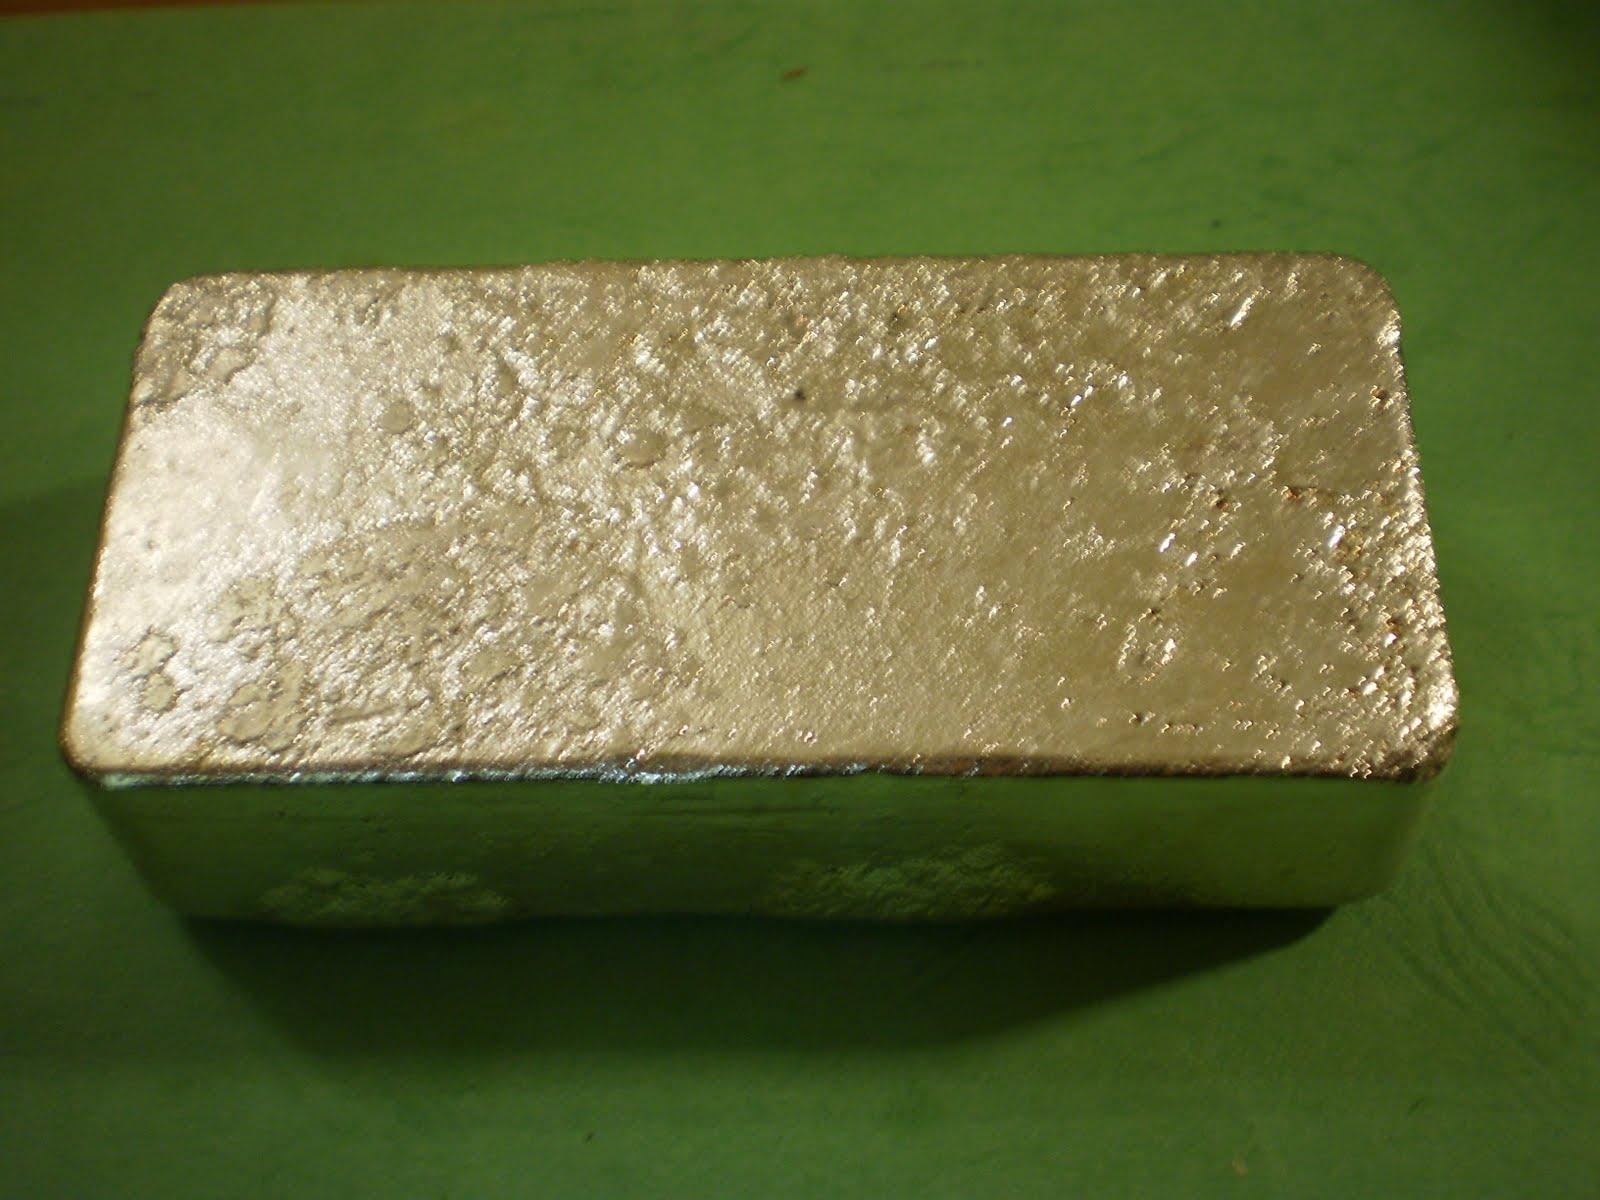 Kilo Silver Bullion Bing Images